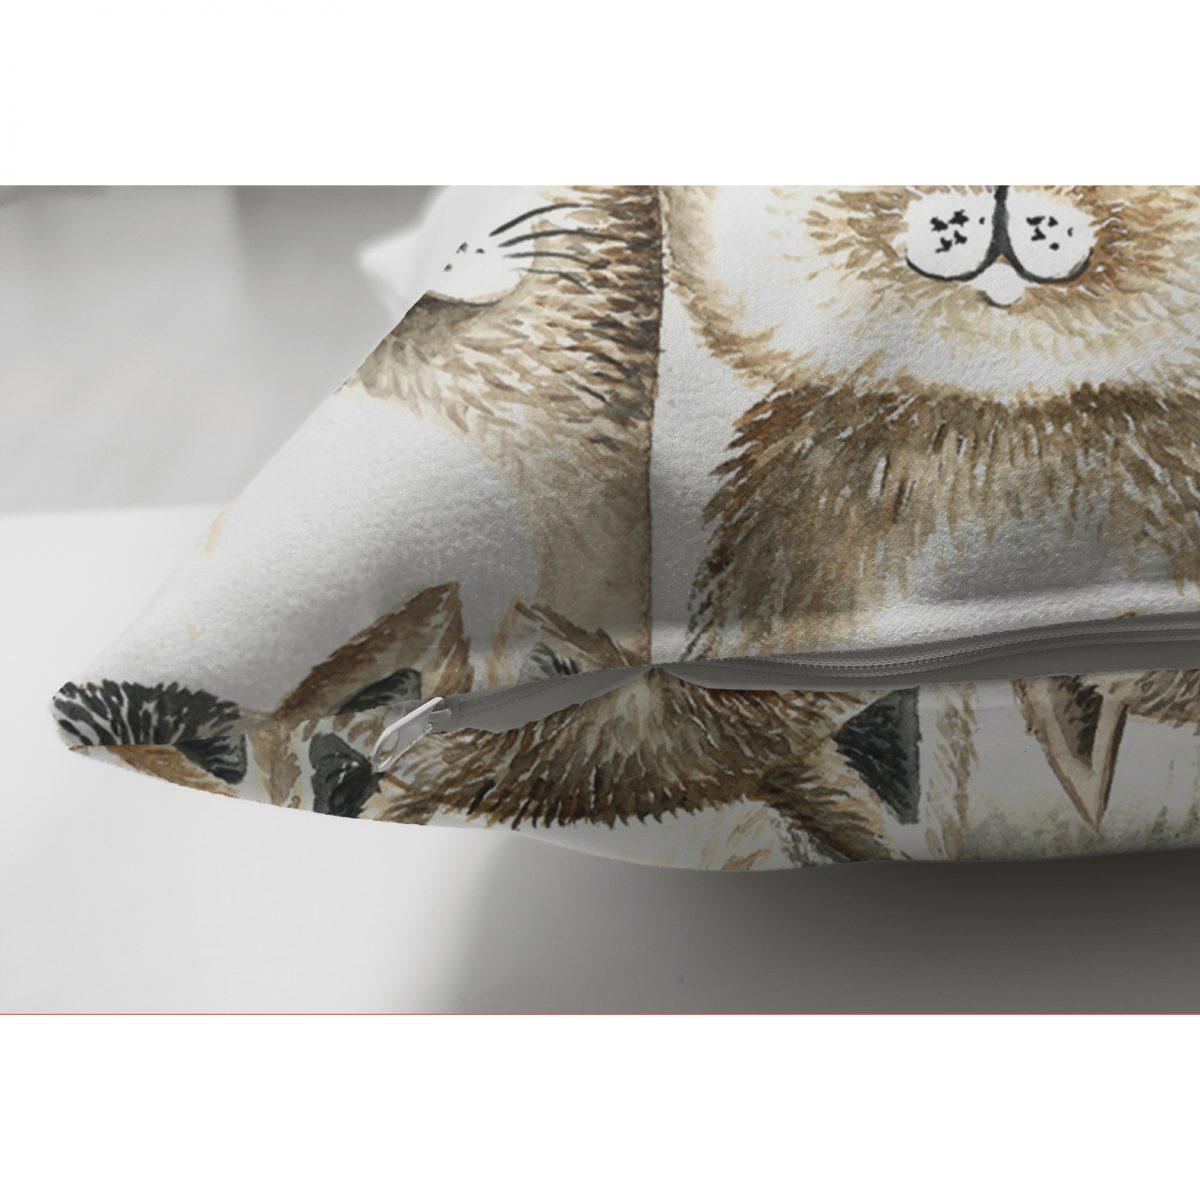 Realhomes Çift Taraflı Kedi Desenli Dijital Baskılı Modern Süet Kırlent Kılıfı Realhomes